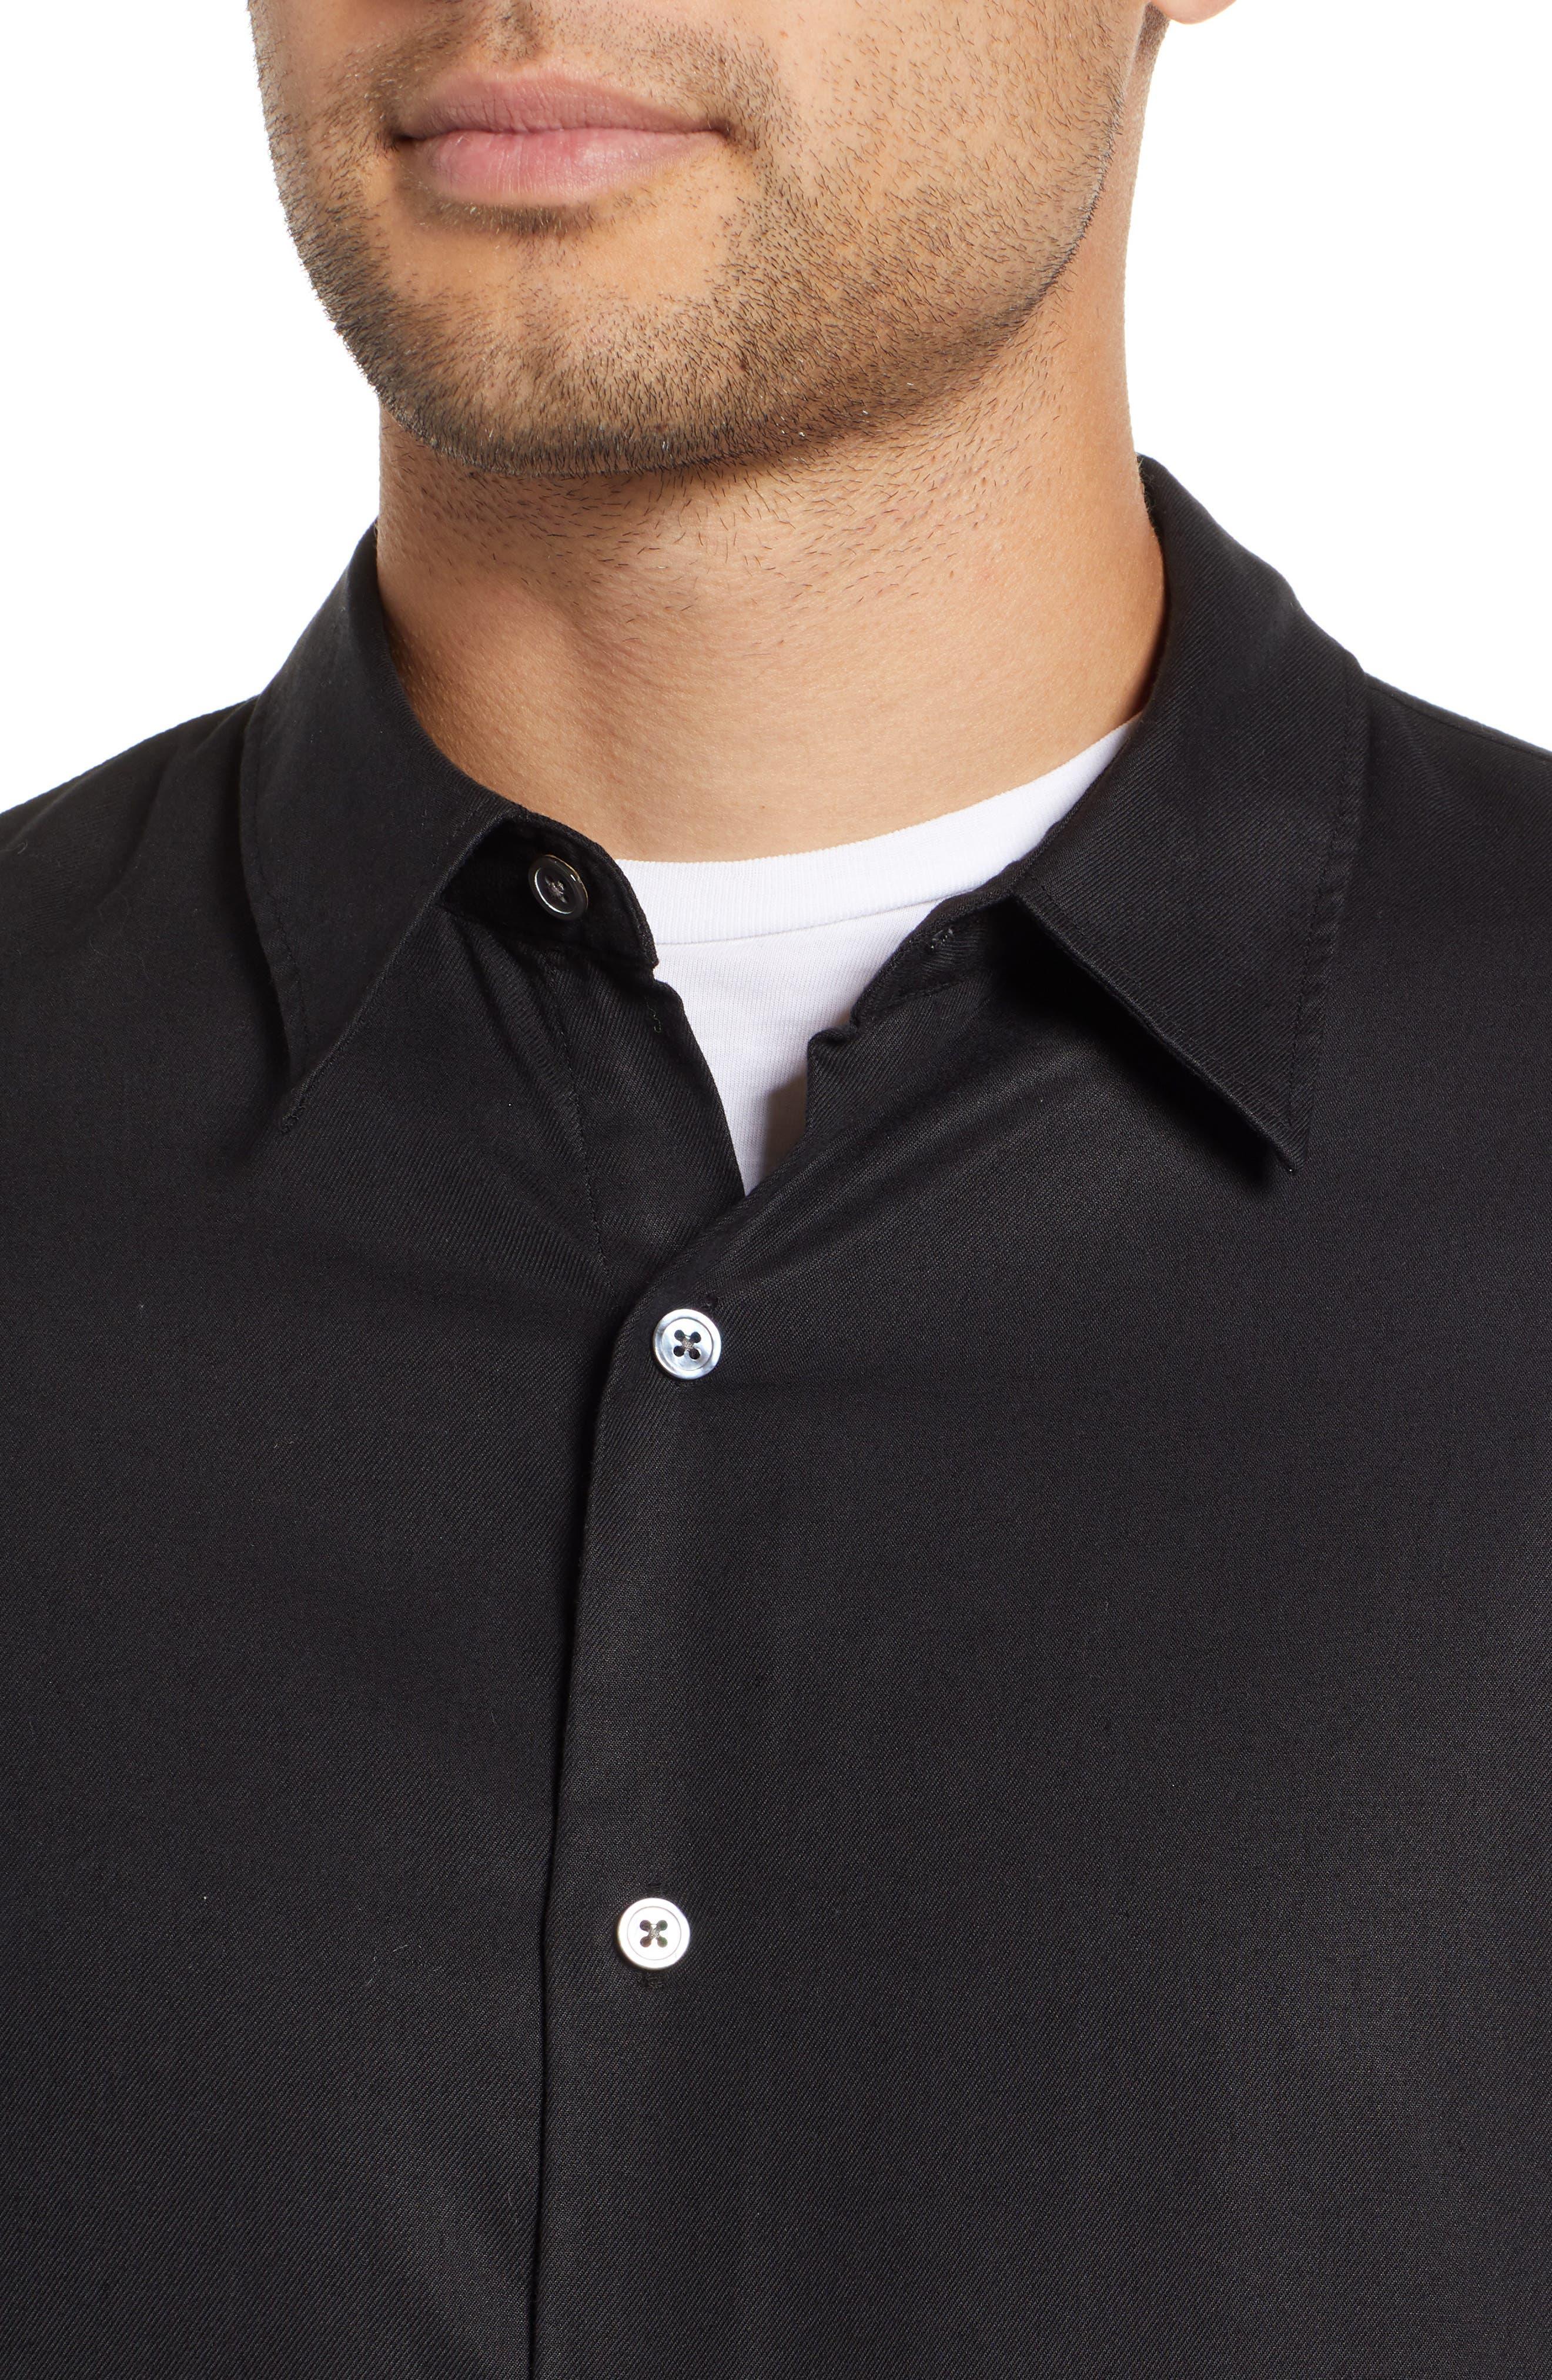 Air Clean Regular Fit Sport Shirt,                             Alternate thumbnail 2, color,                             BLACK